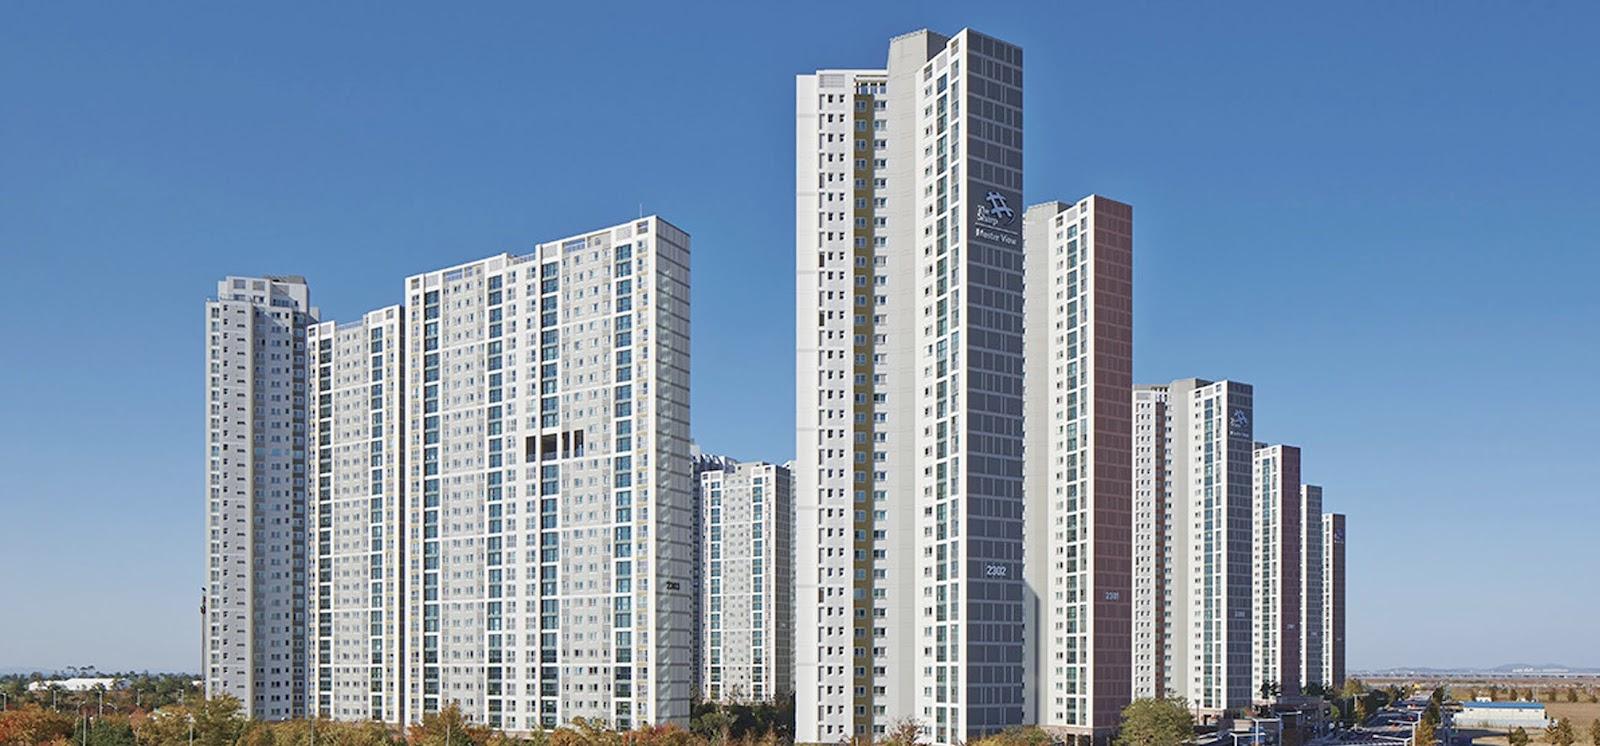 Songdo Apartment Housing The Master View Seoul Incheon Korea